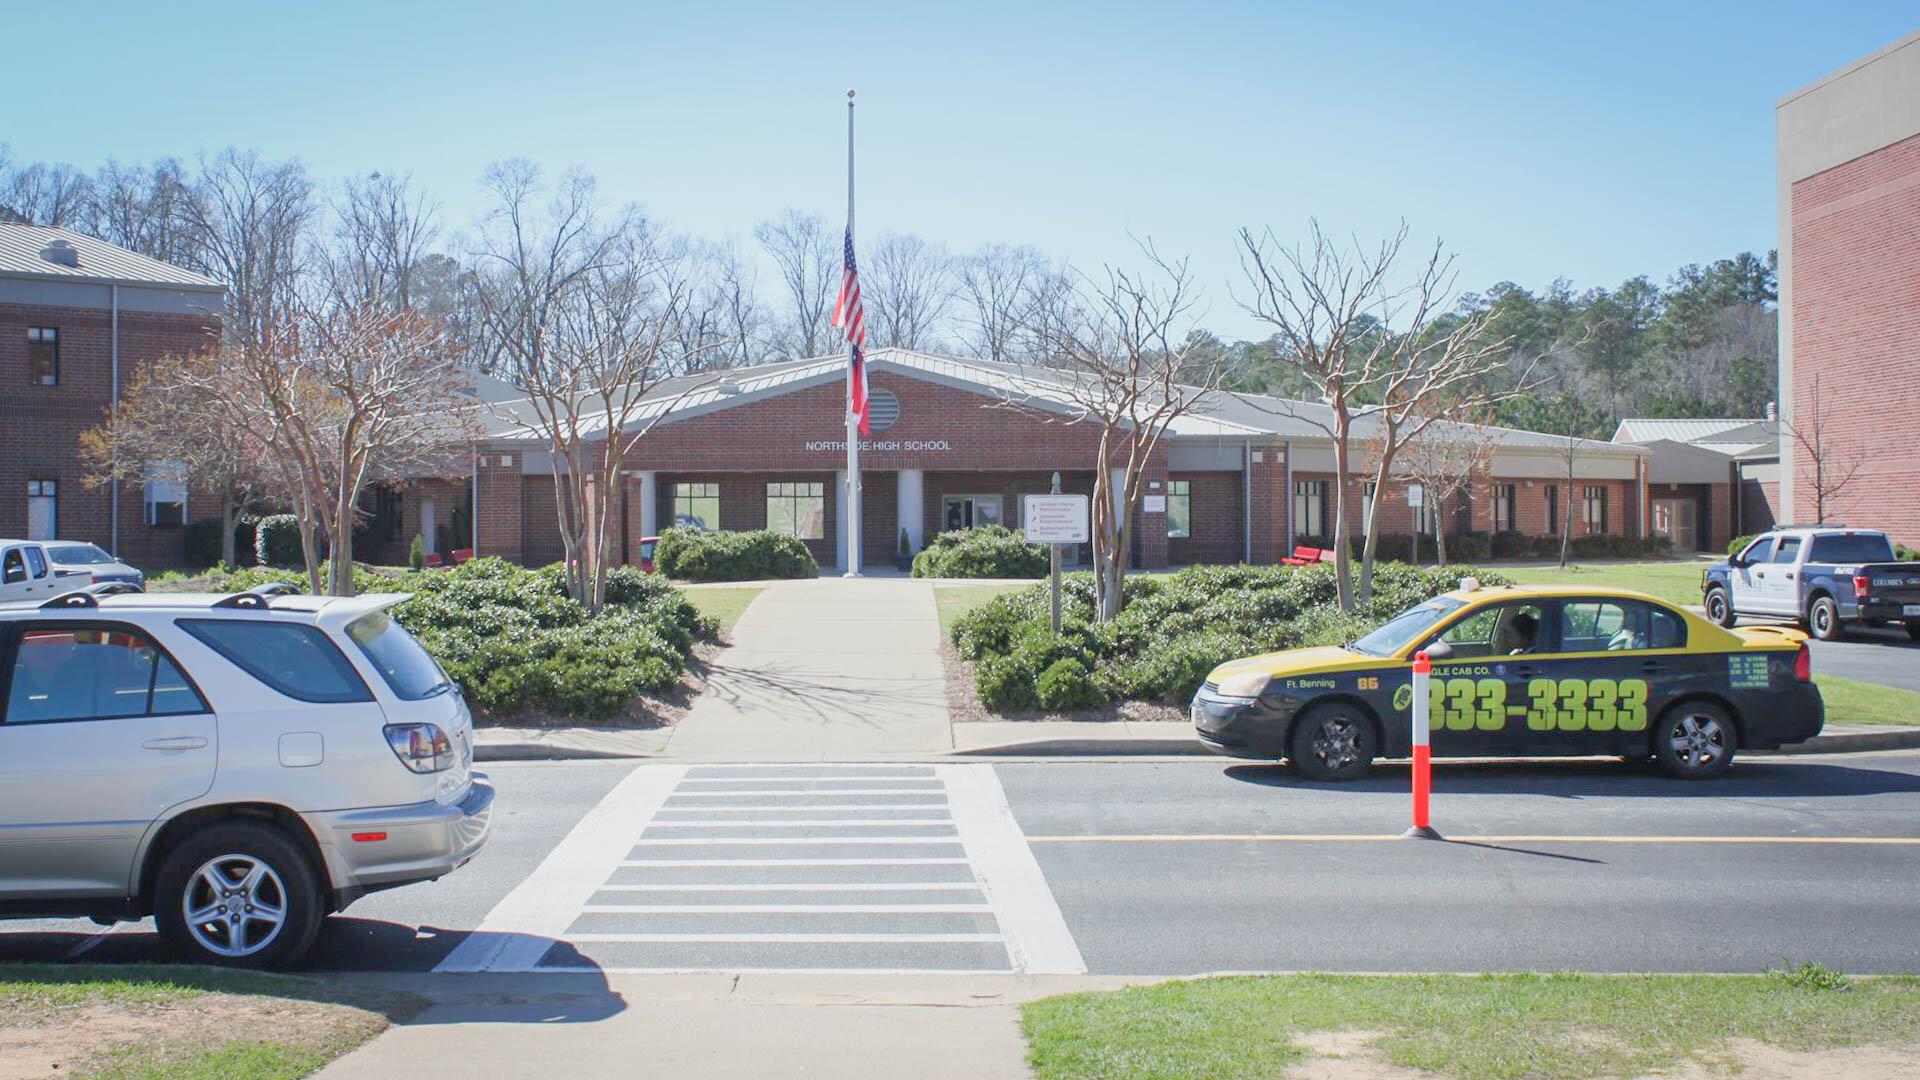 northsidehighschool-1.jpg